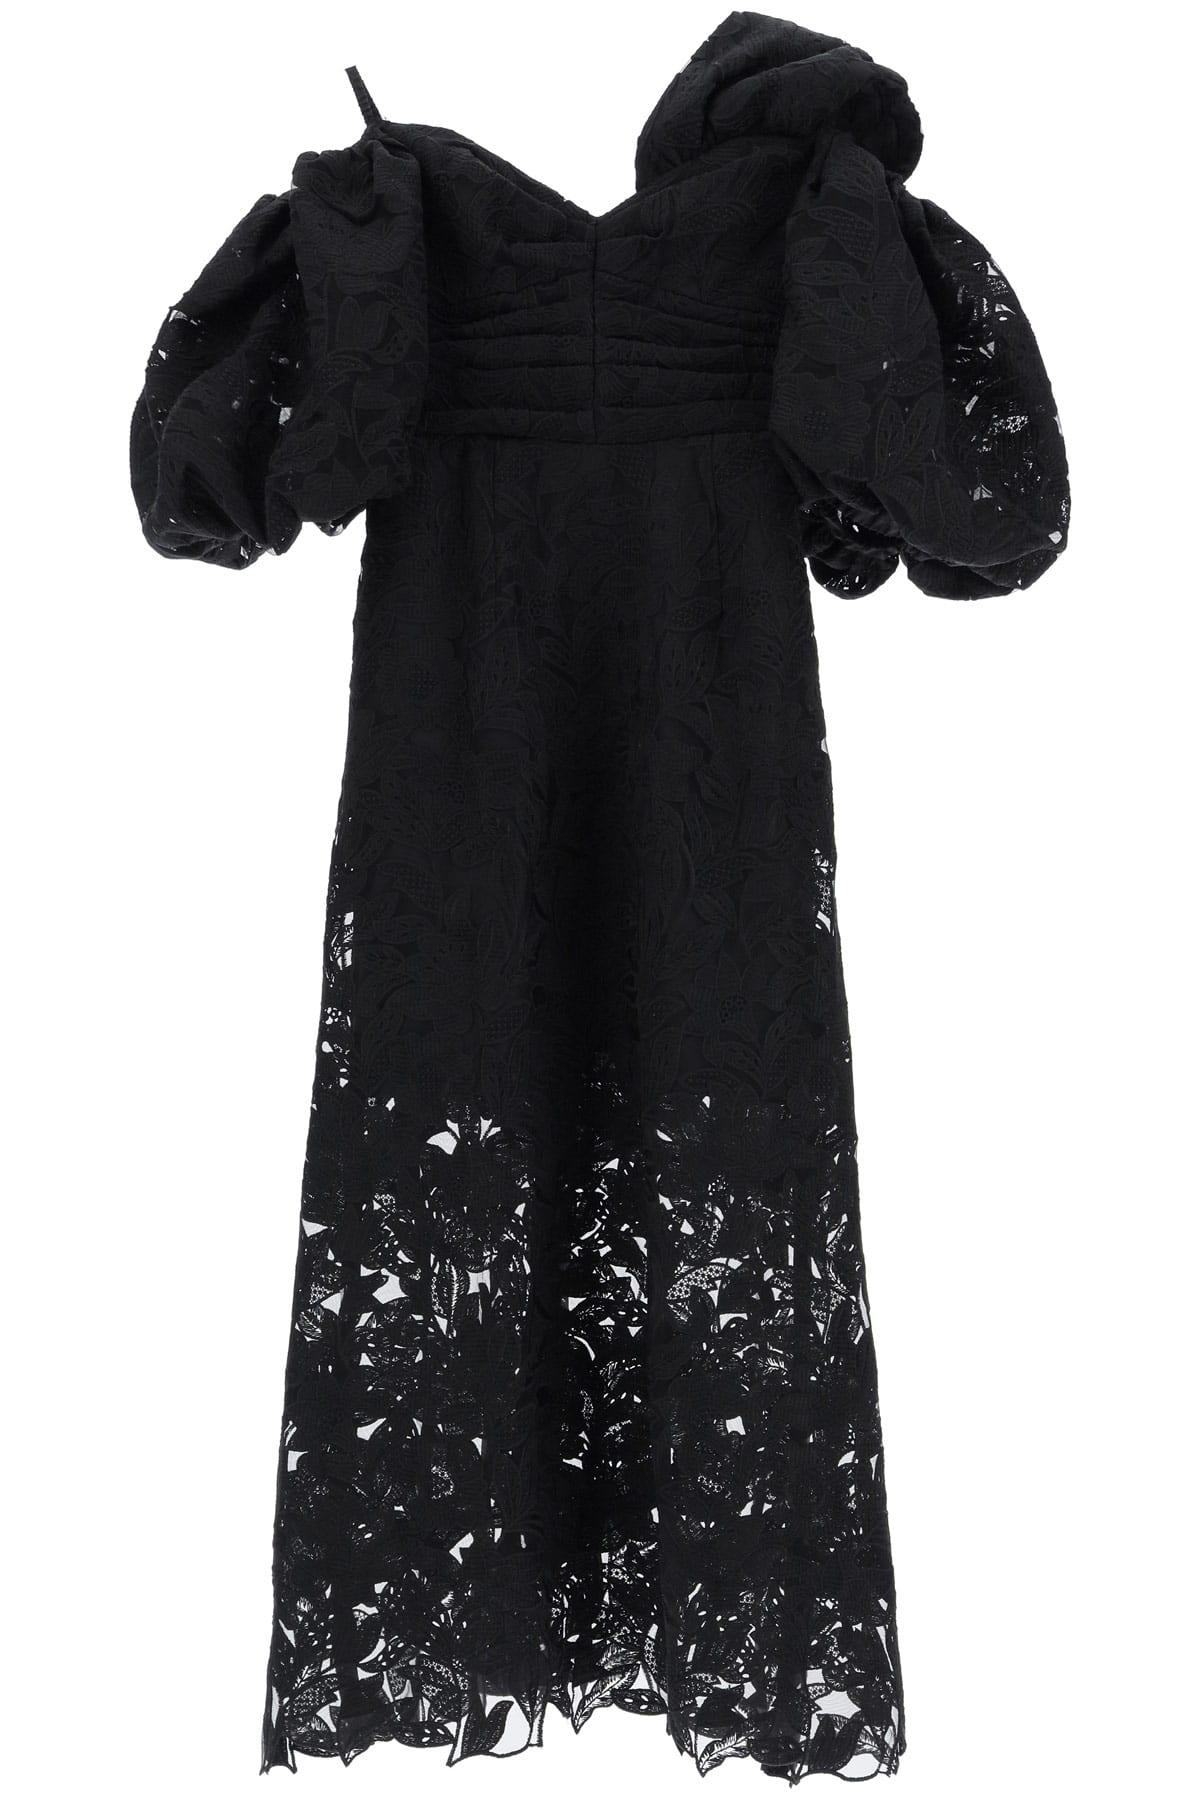 SELF PORTRAIT MIDI LACE DRESS 10 Black